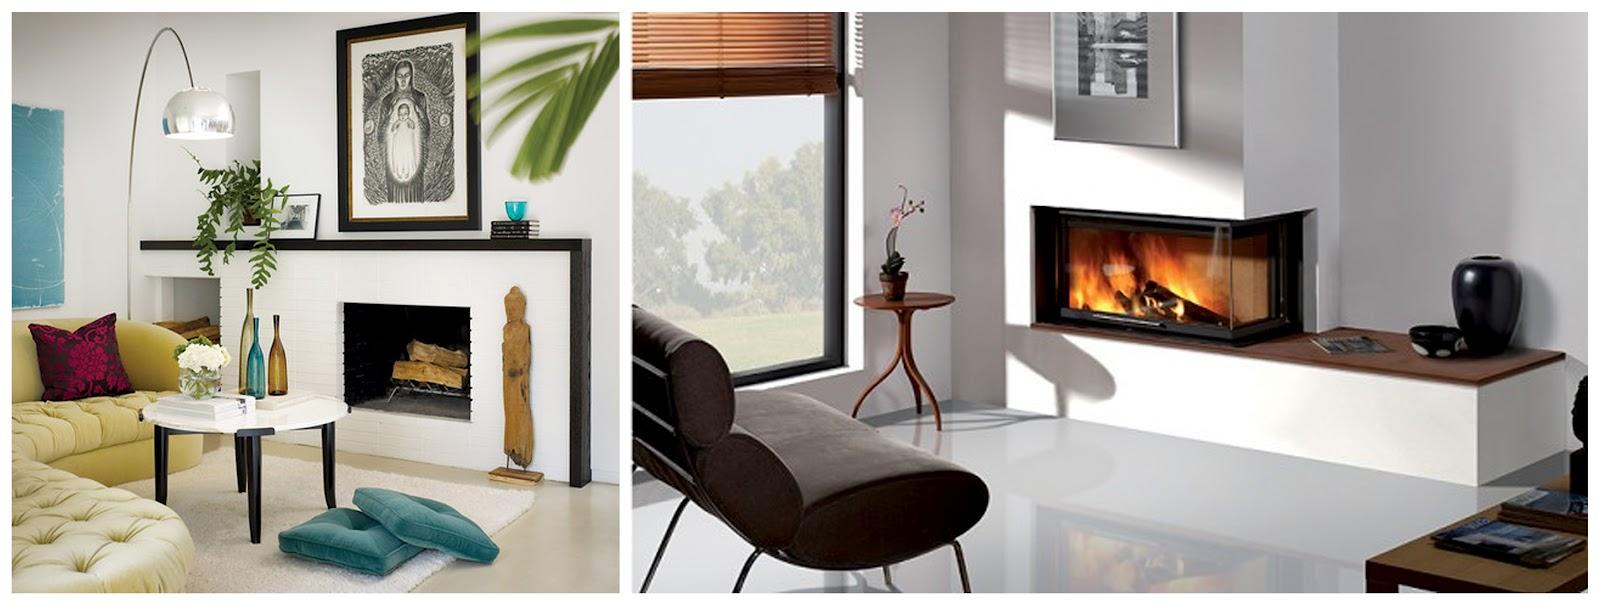 Element 5 Design | The Blog: Design Lesson: 7 Principles ...